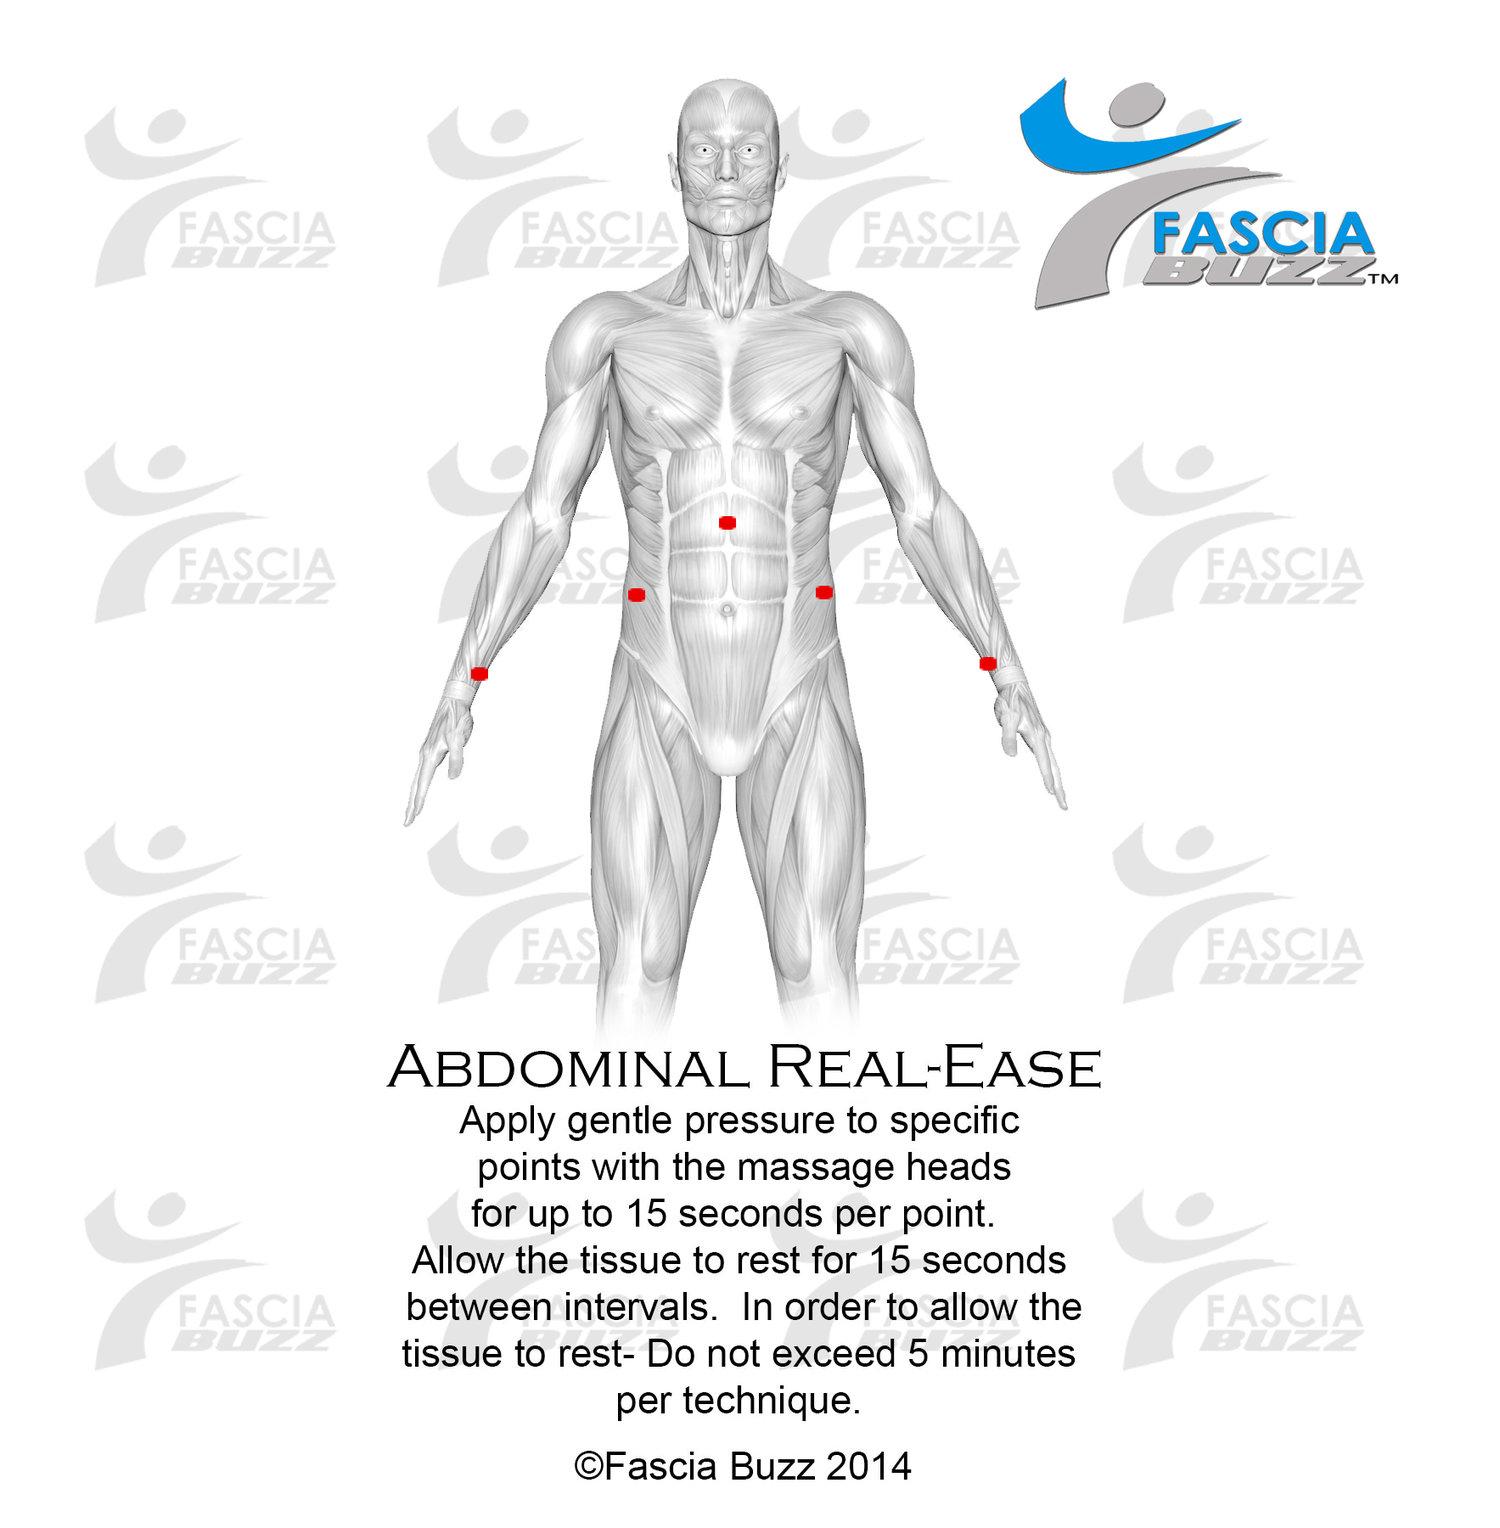 real-ease_abdomen.jpg